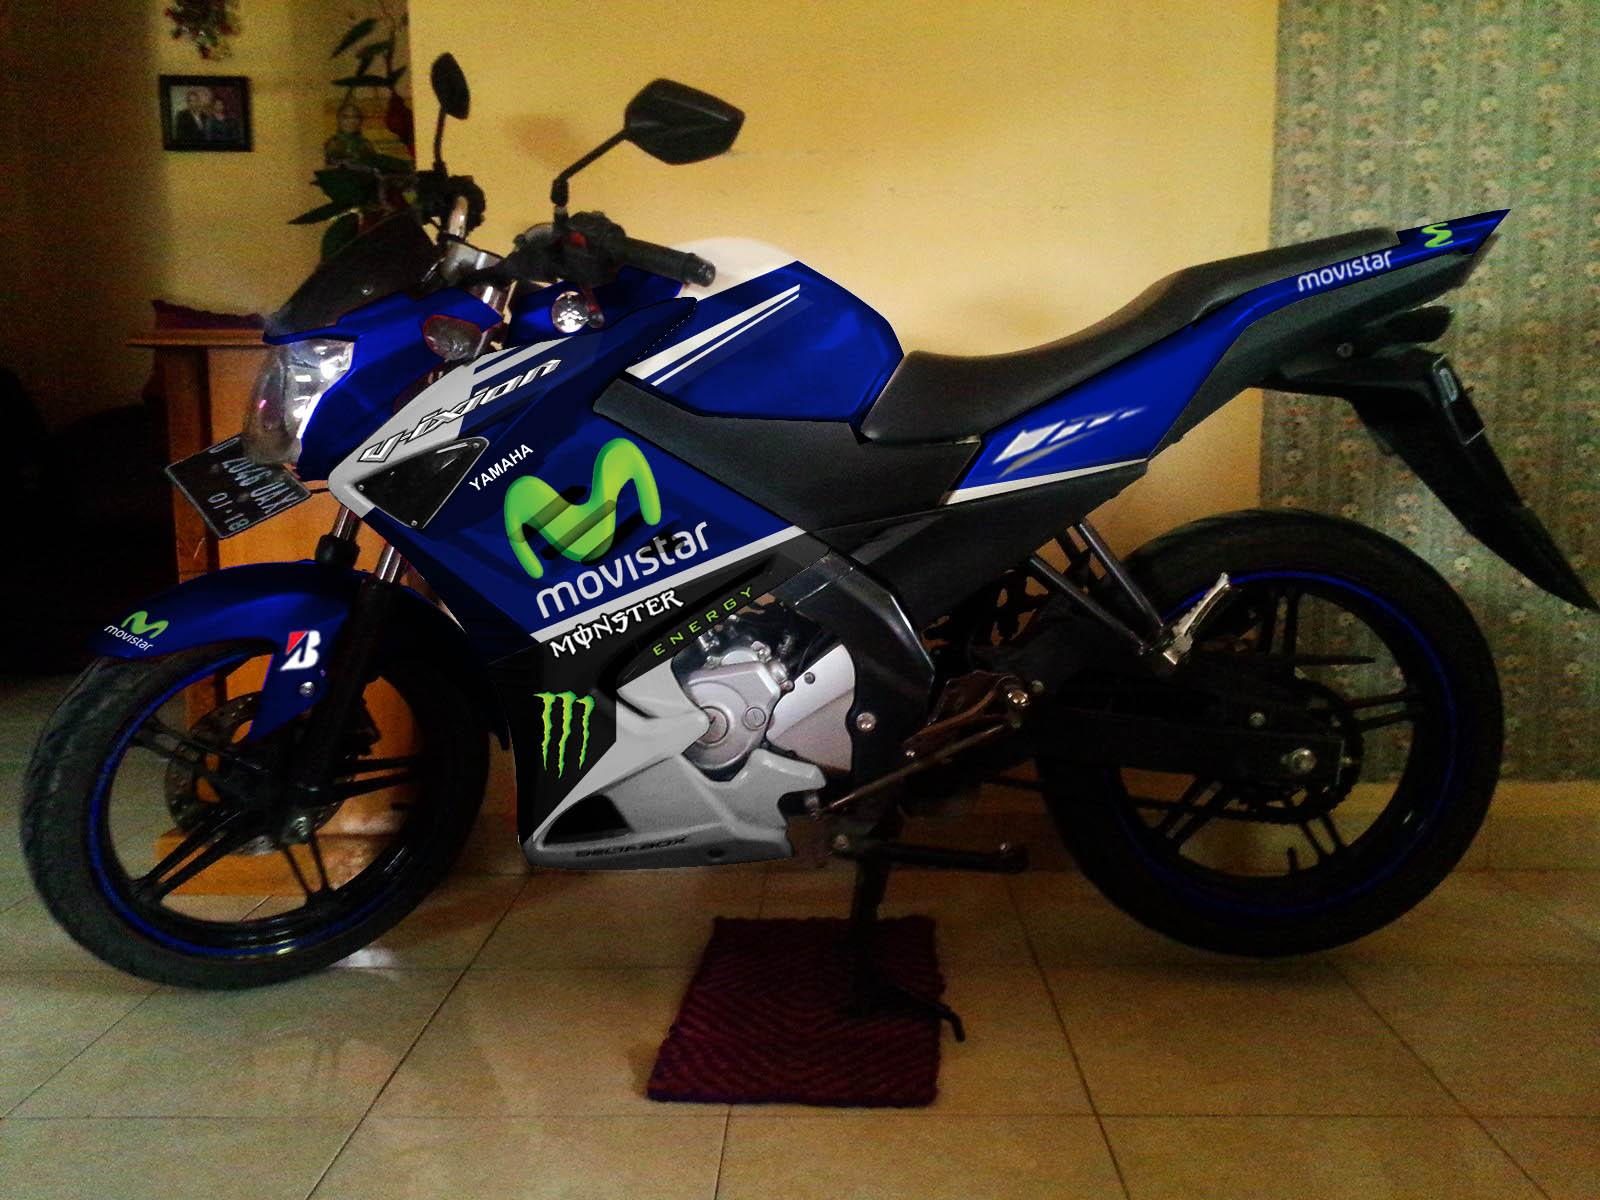 Modif Striping Yamaha new Vixion Half fairing Movistar Yamaha Motogp ...